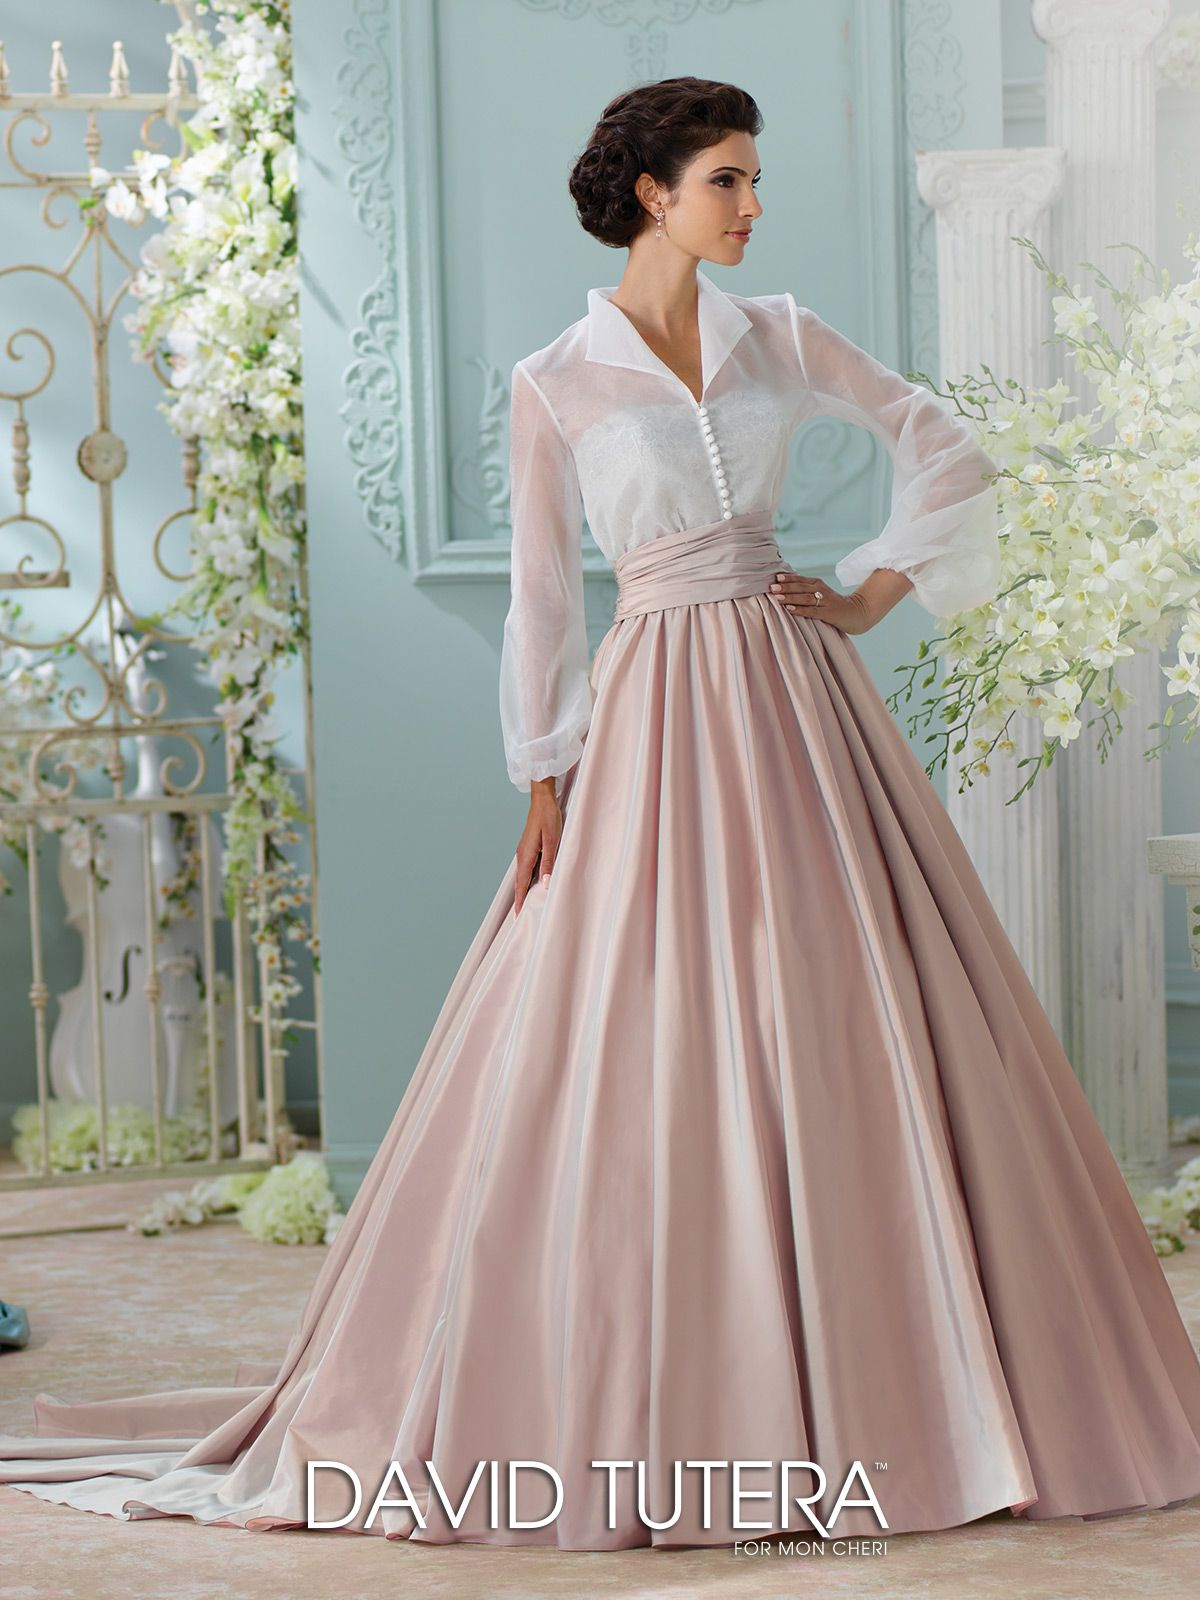 Wedding Dresses 2017 & Spring 2018 | Taffeta skirt, Lace bodice and ...